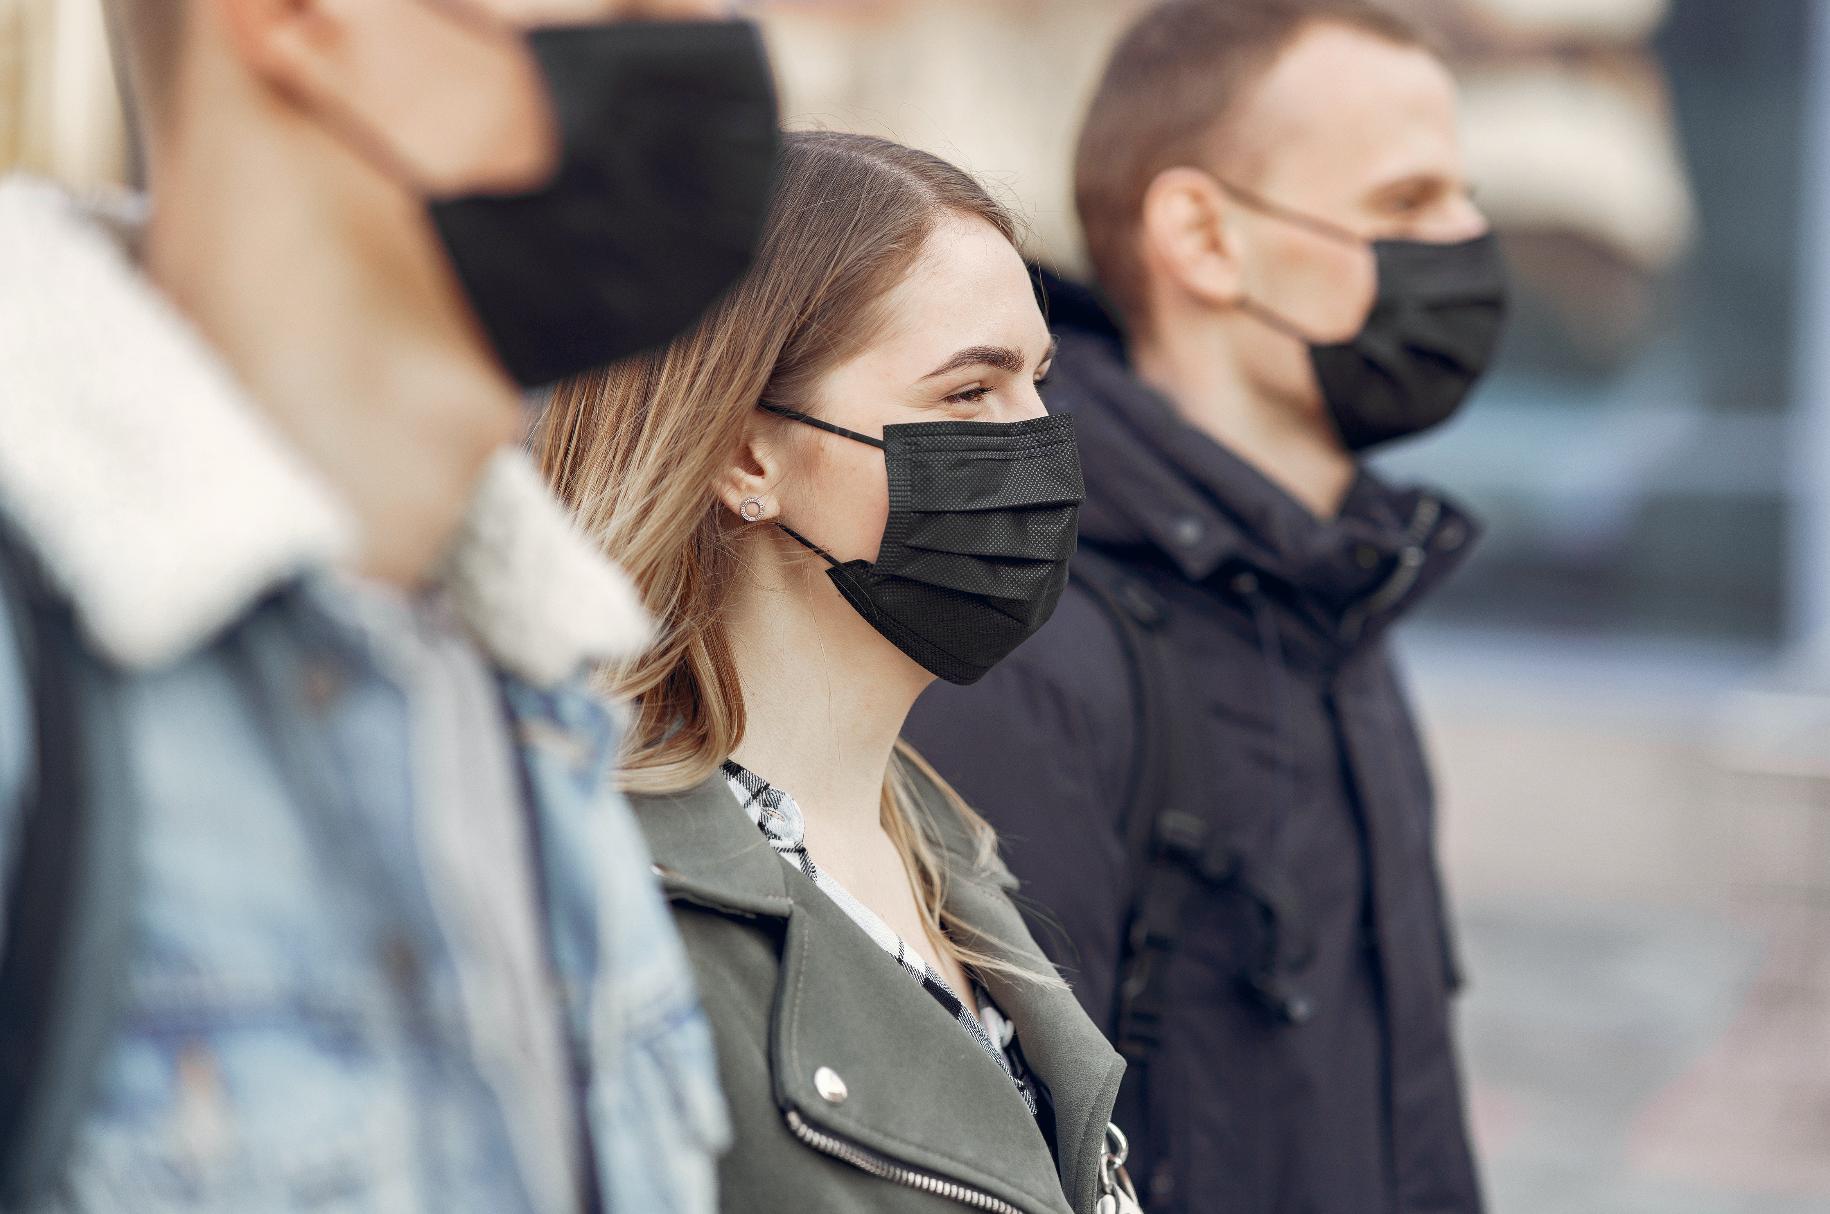 Aparece un grupo de personas con mascarilla